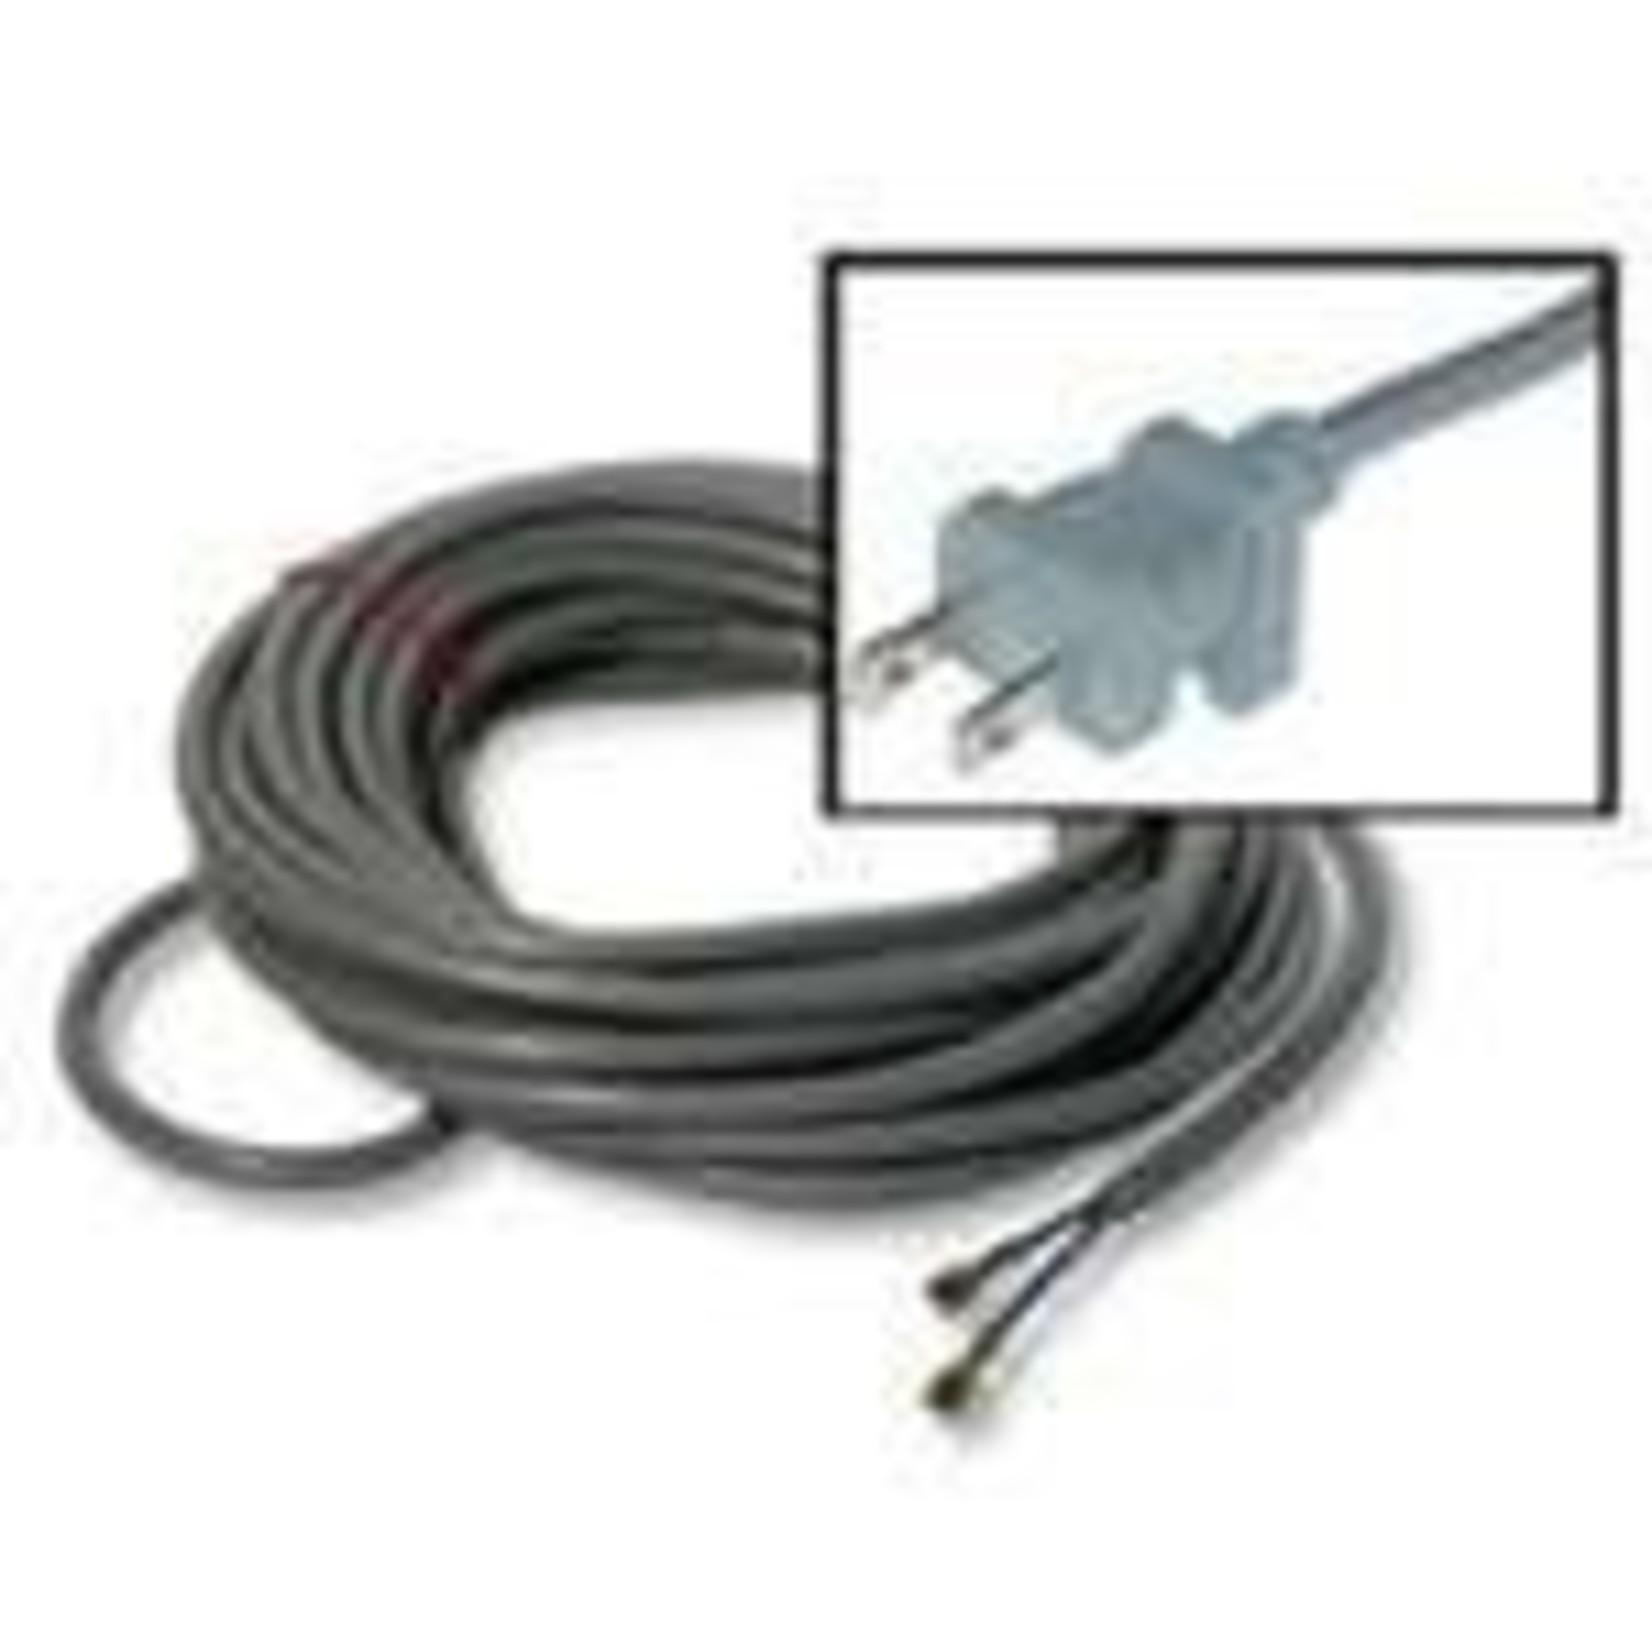 Dyson Dyson DC17 Power Cord - Fits DC07/14/18/25